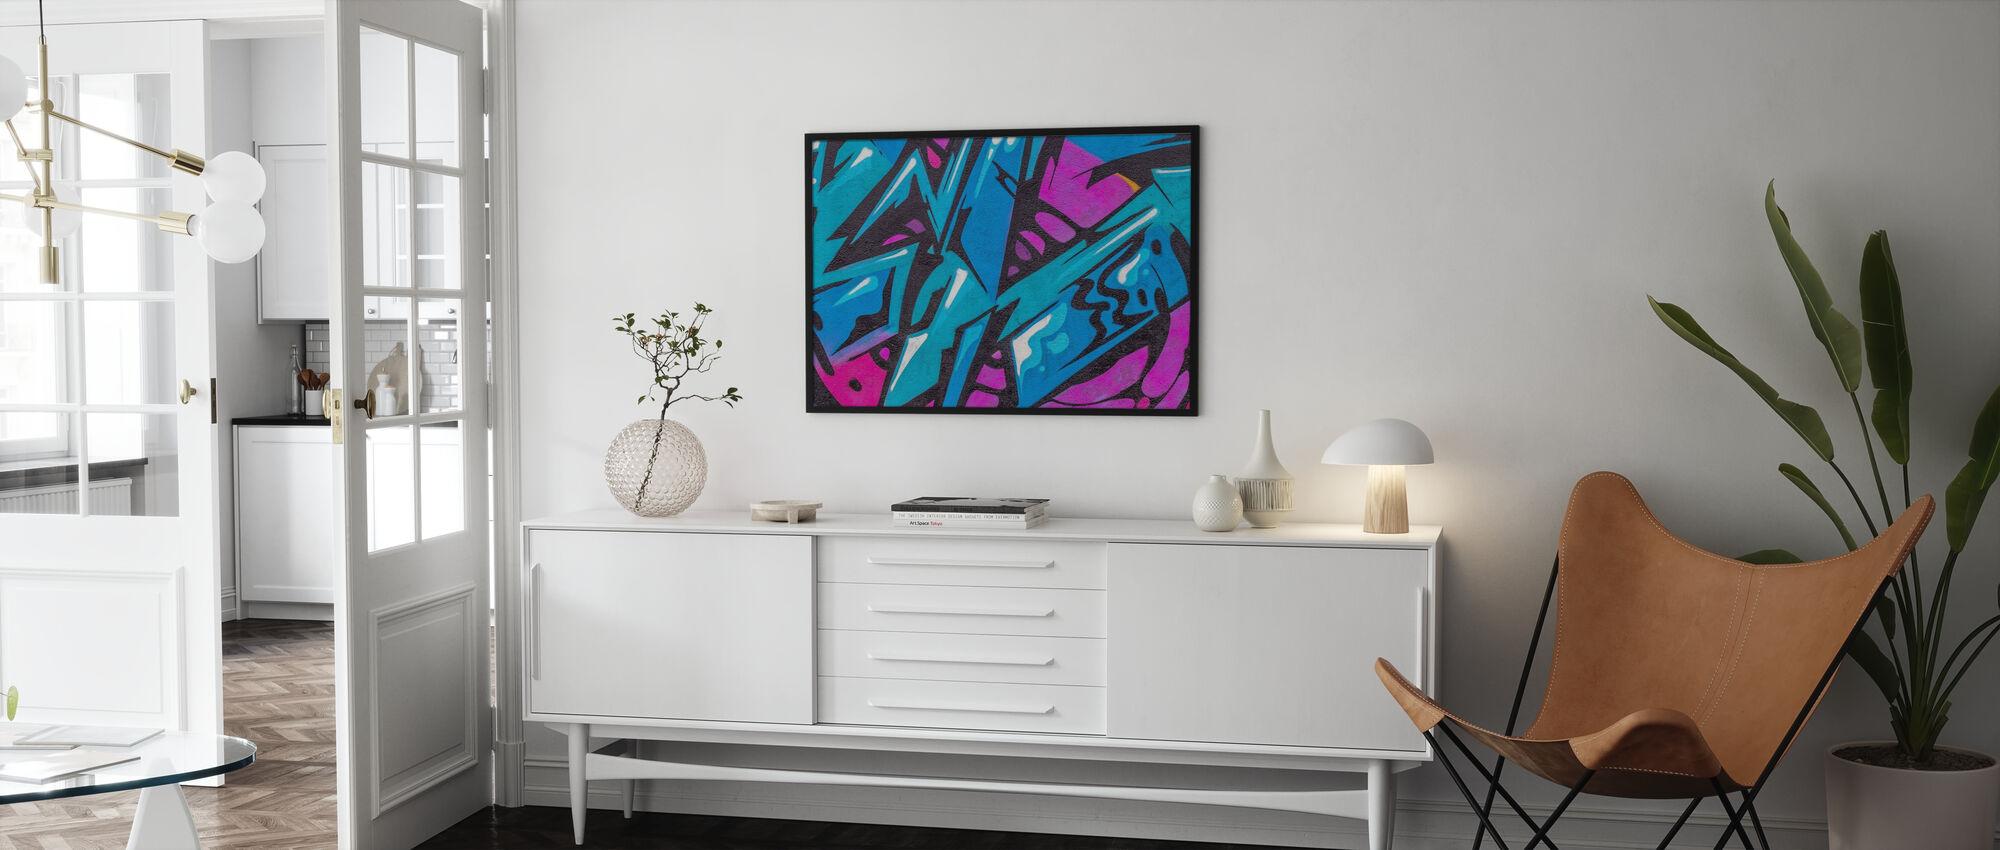 Modische Farbe Graffiti - Poster - Wohnzimmer